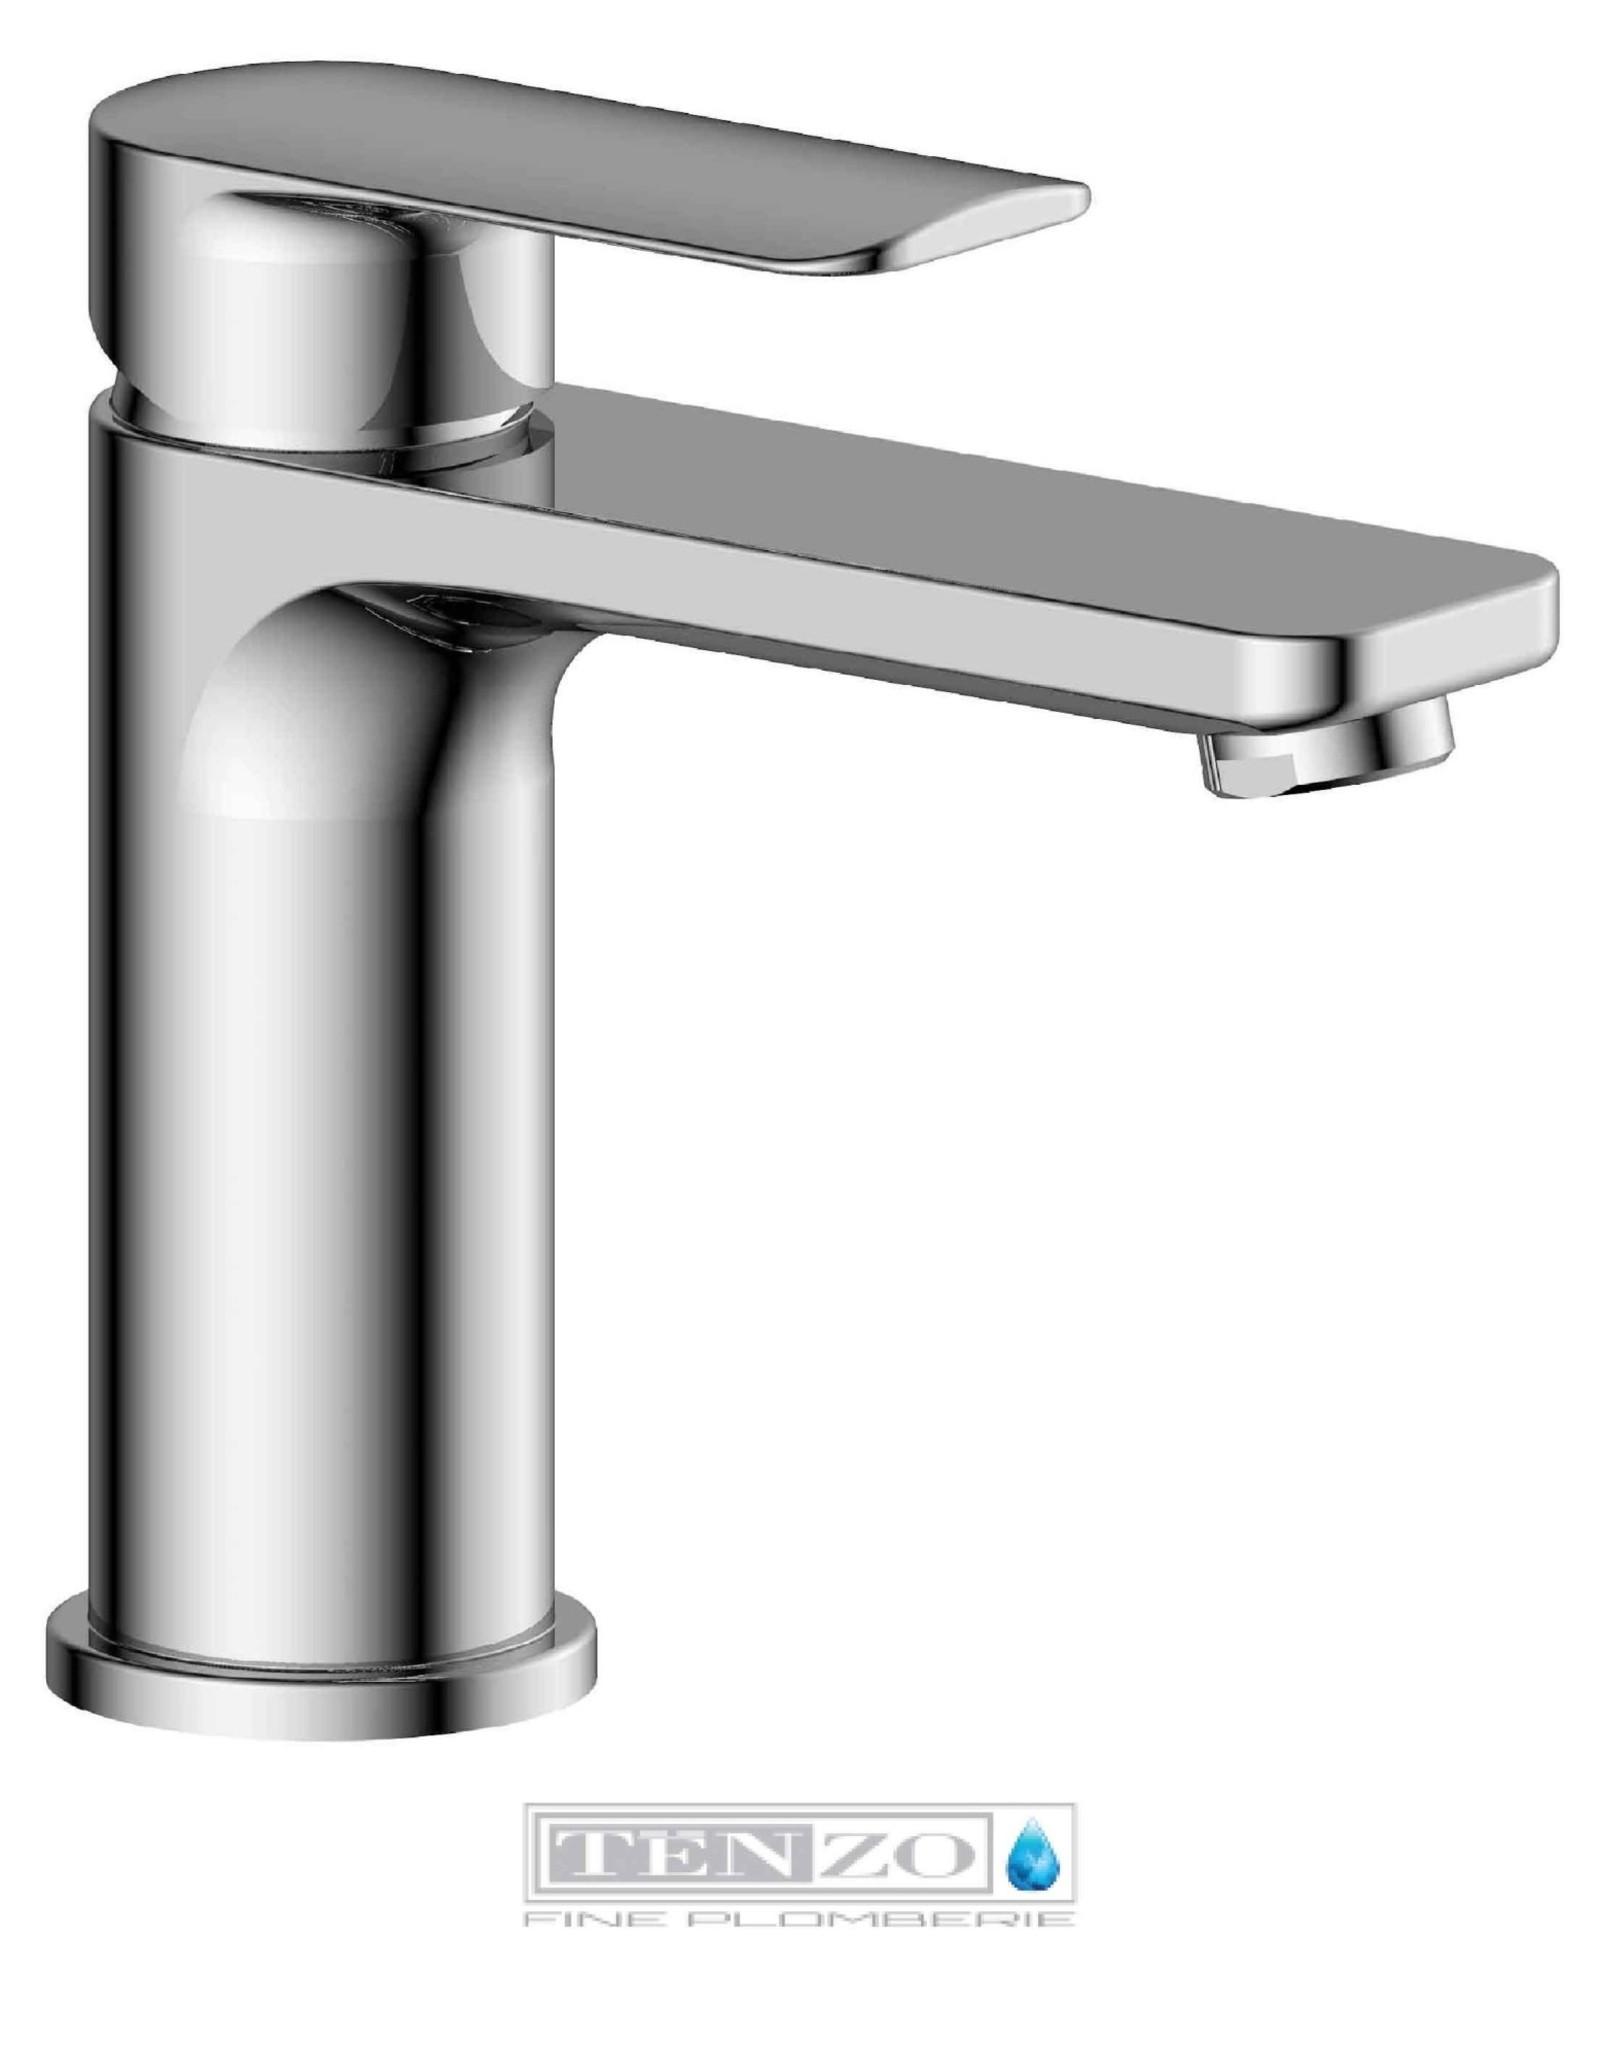 Tenzo Tenzo Delano Single Lav Faucet